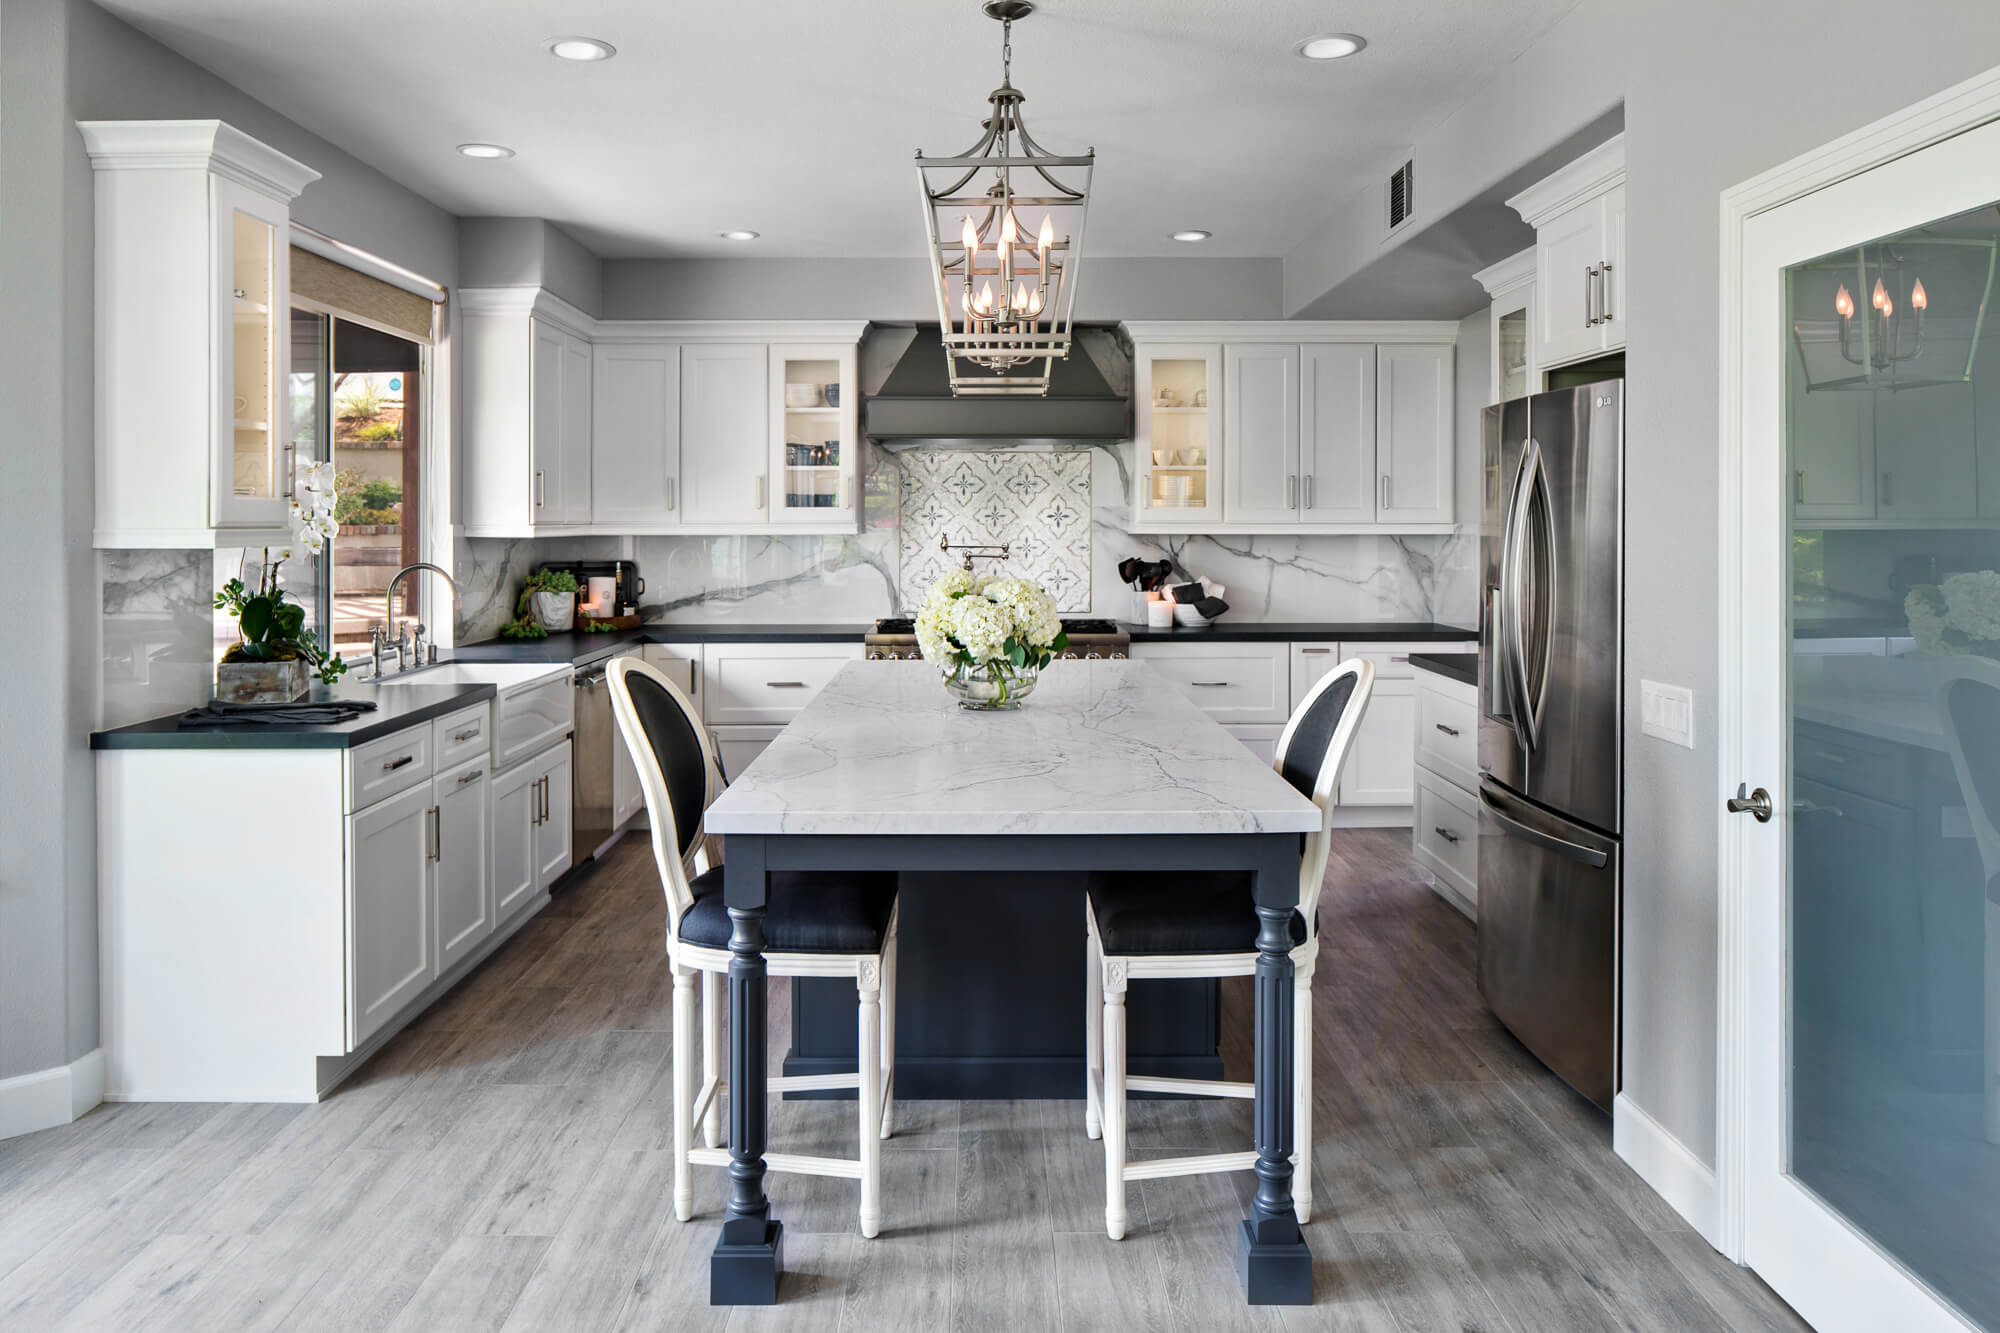 quartz-countertop-timeless-kitchen-design